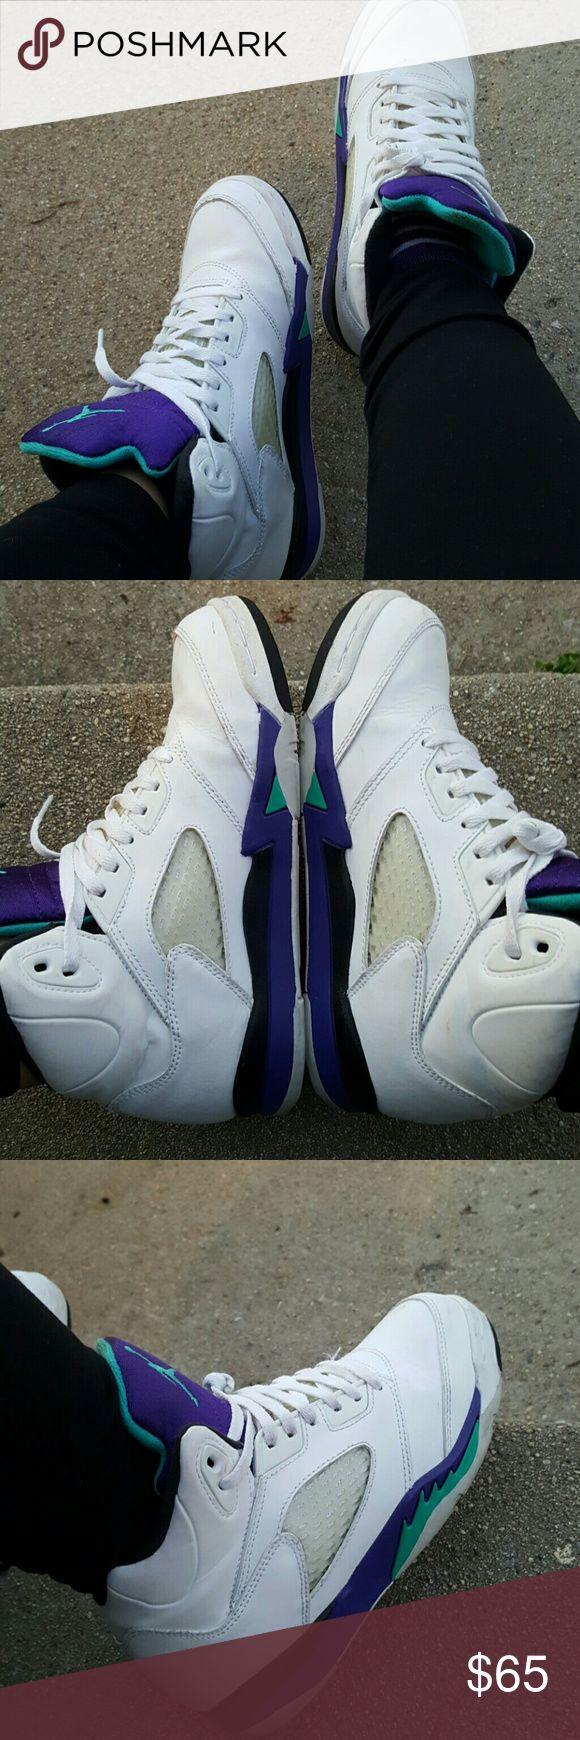 Selling this 🍇 Nike Air Jordan Retro 5 on Poshmark! My username is: evewithluv. #shopmycloset #poshmark #fashion #shopping #style #forsale #Jordan #Shoes